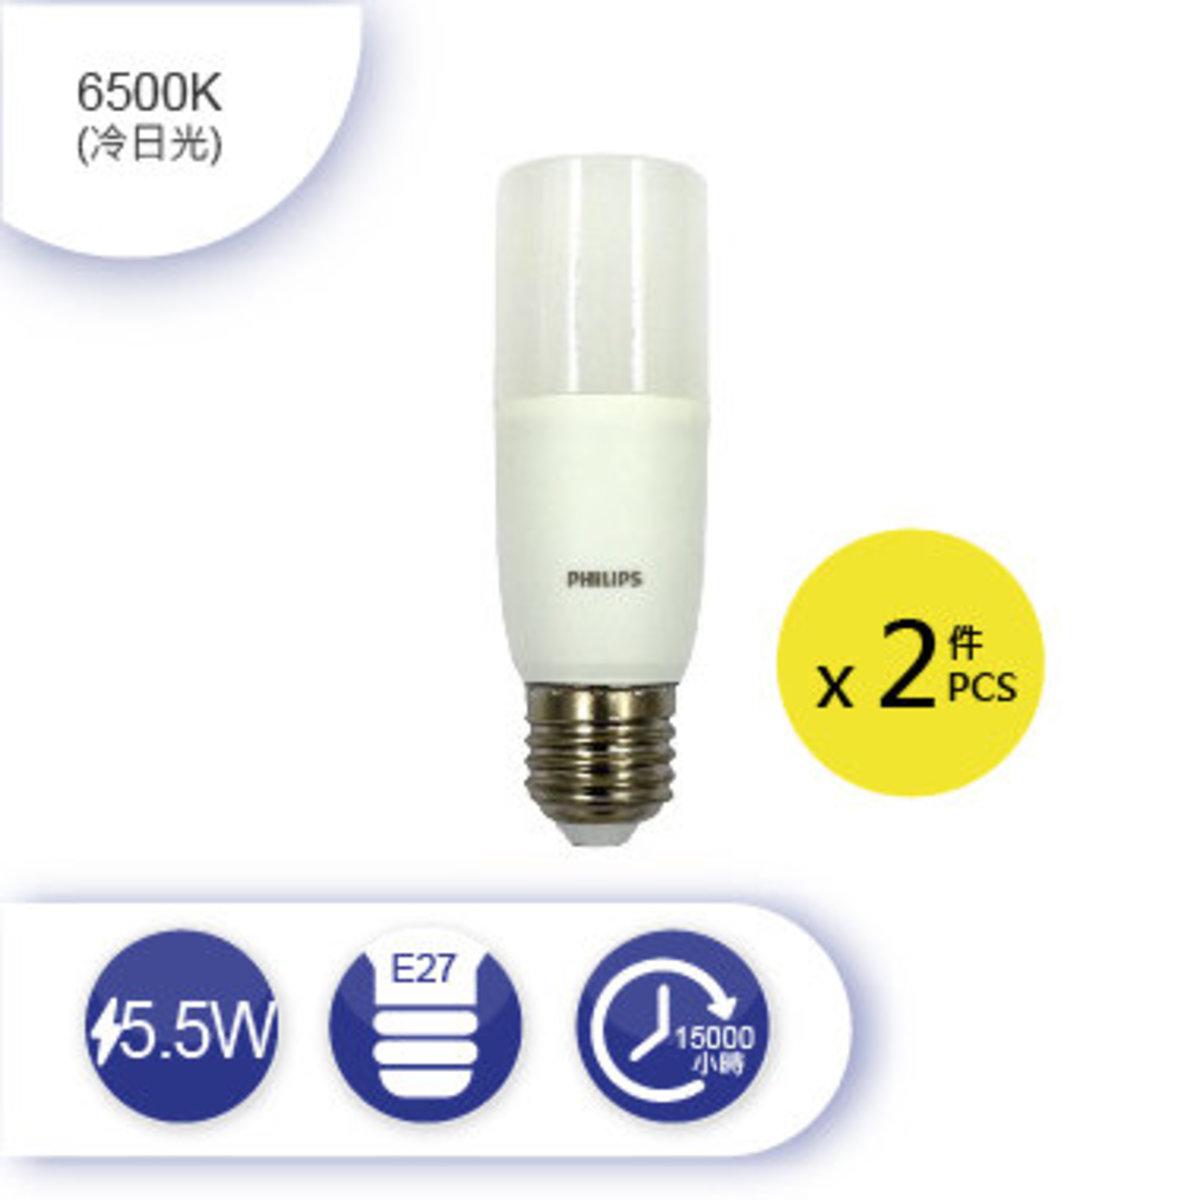 LED Stick  5.5W E27 6500K - pack of 2